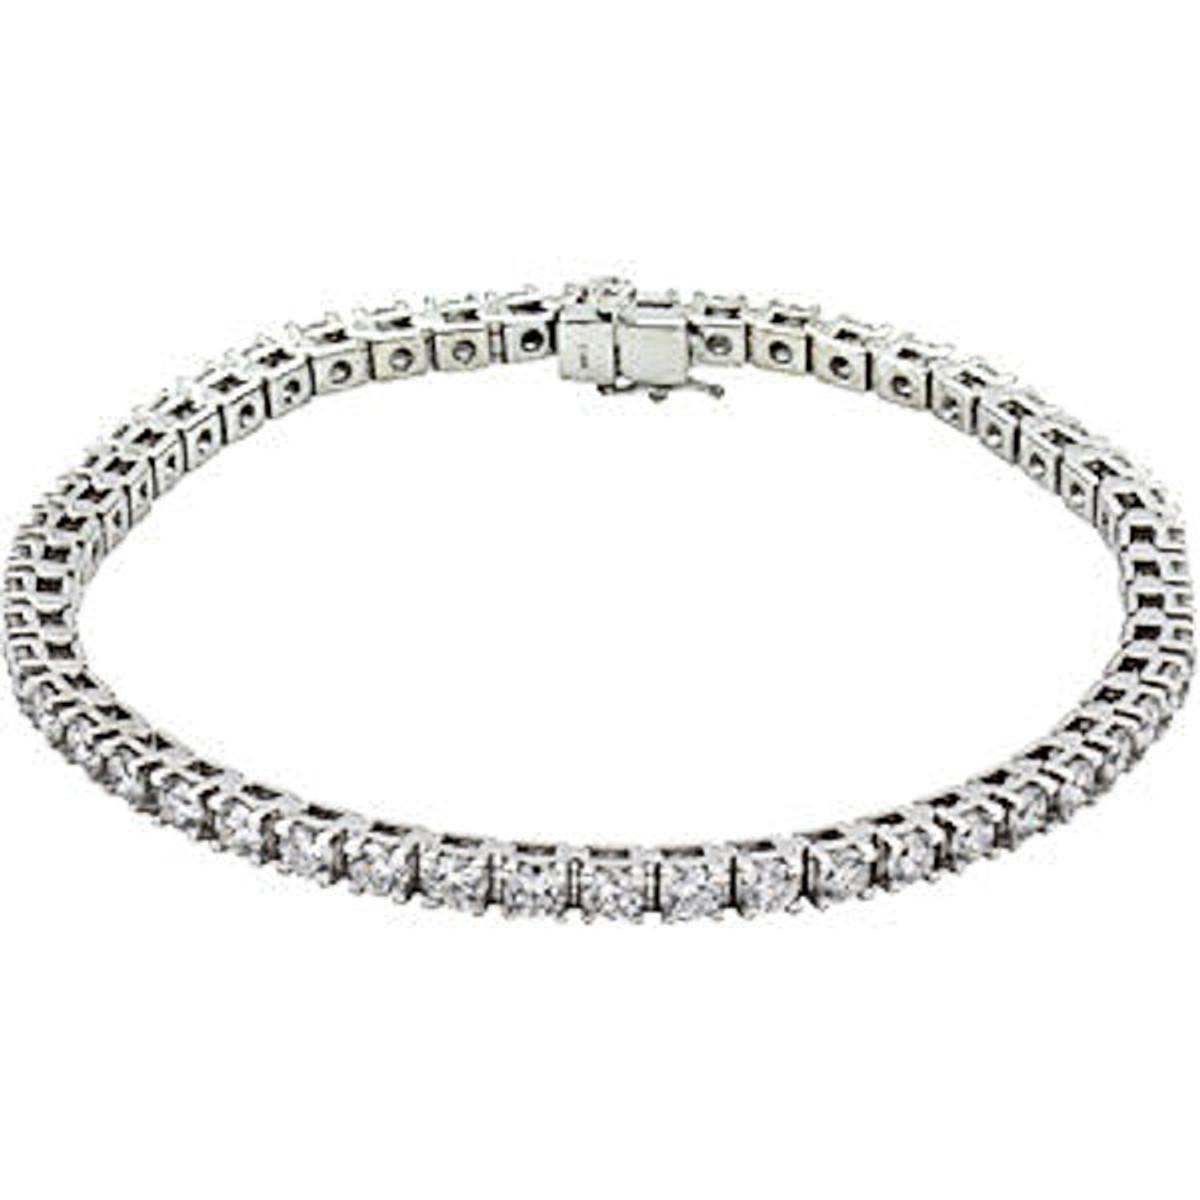 14Kt White Gold 5.0 ct tw Diamond Tennis Bracelet